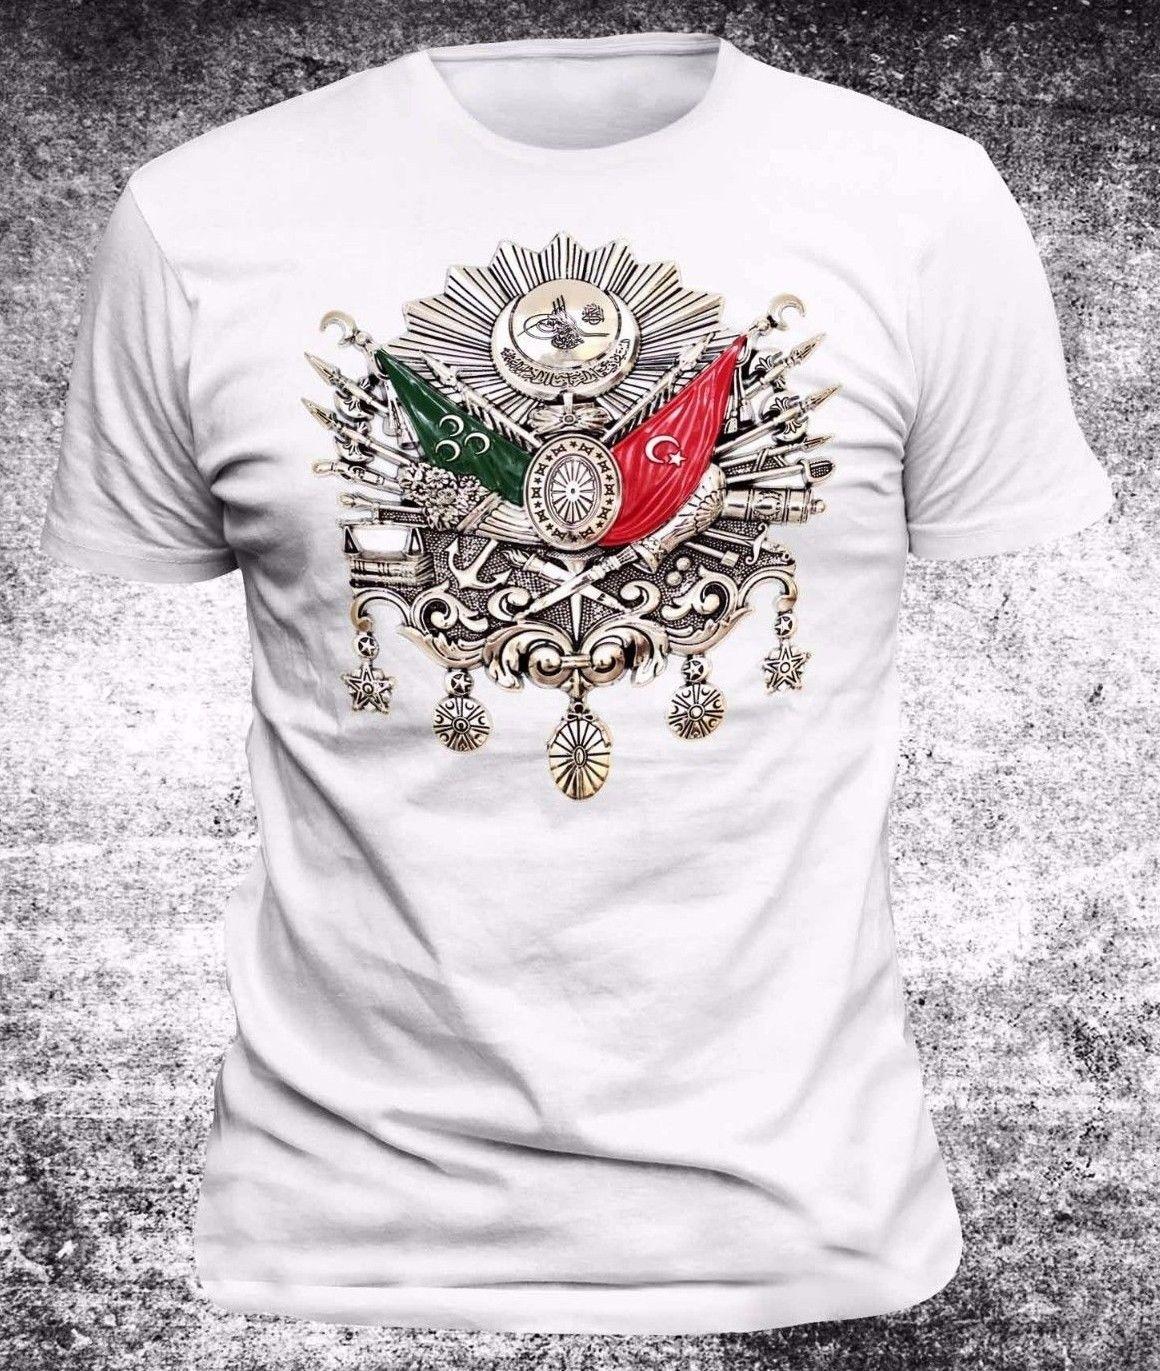 2018 Hot Sale T-Shirt Turkiye,The Ottoman Lieutenant,Istanbul,Turkei T Shirt Summer Style Tee Shirt Harajuku Streetwear